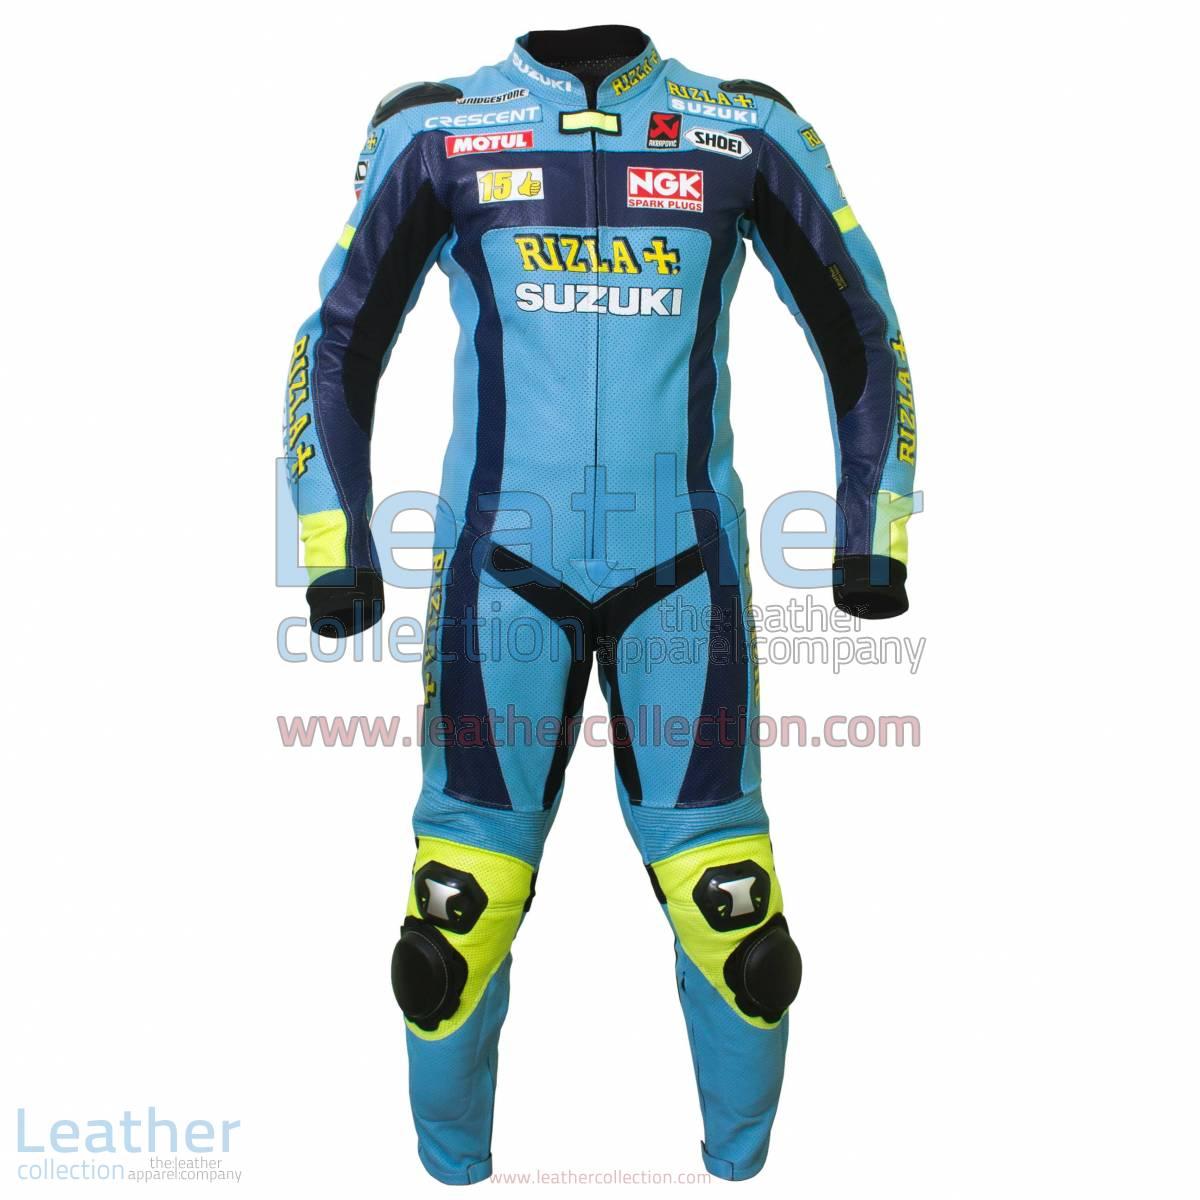 Rizla Suzuki 2013 Motorbike Leathers | motorcycle leathers